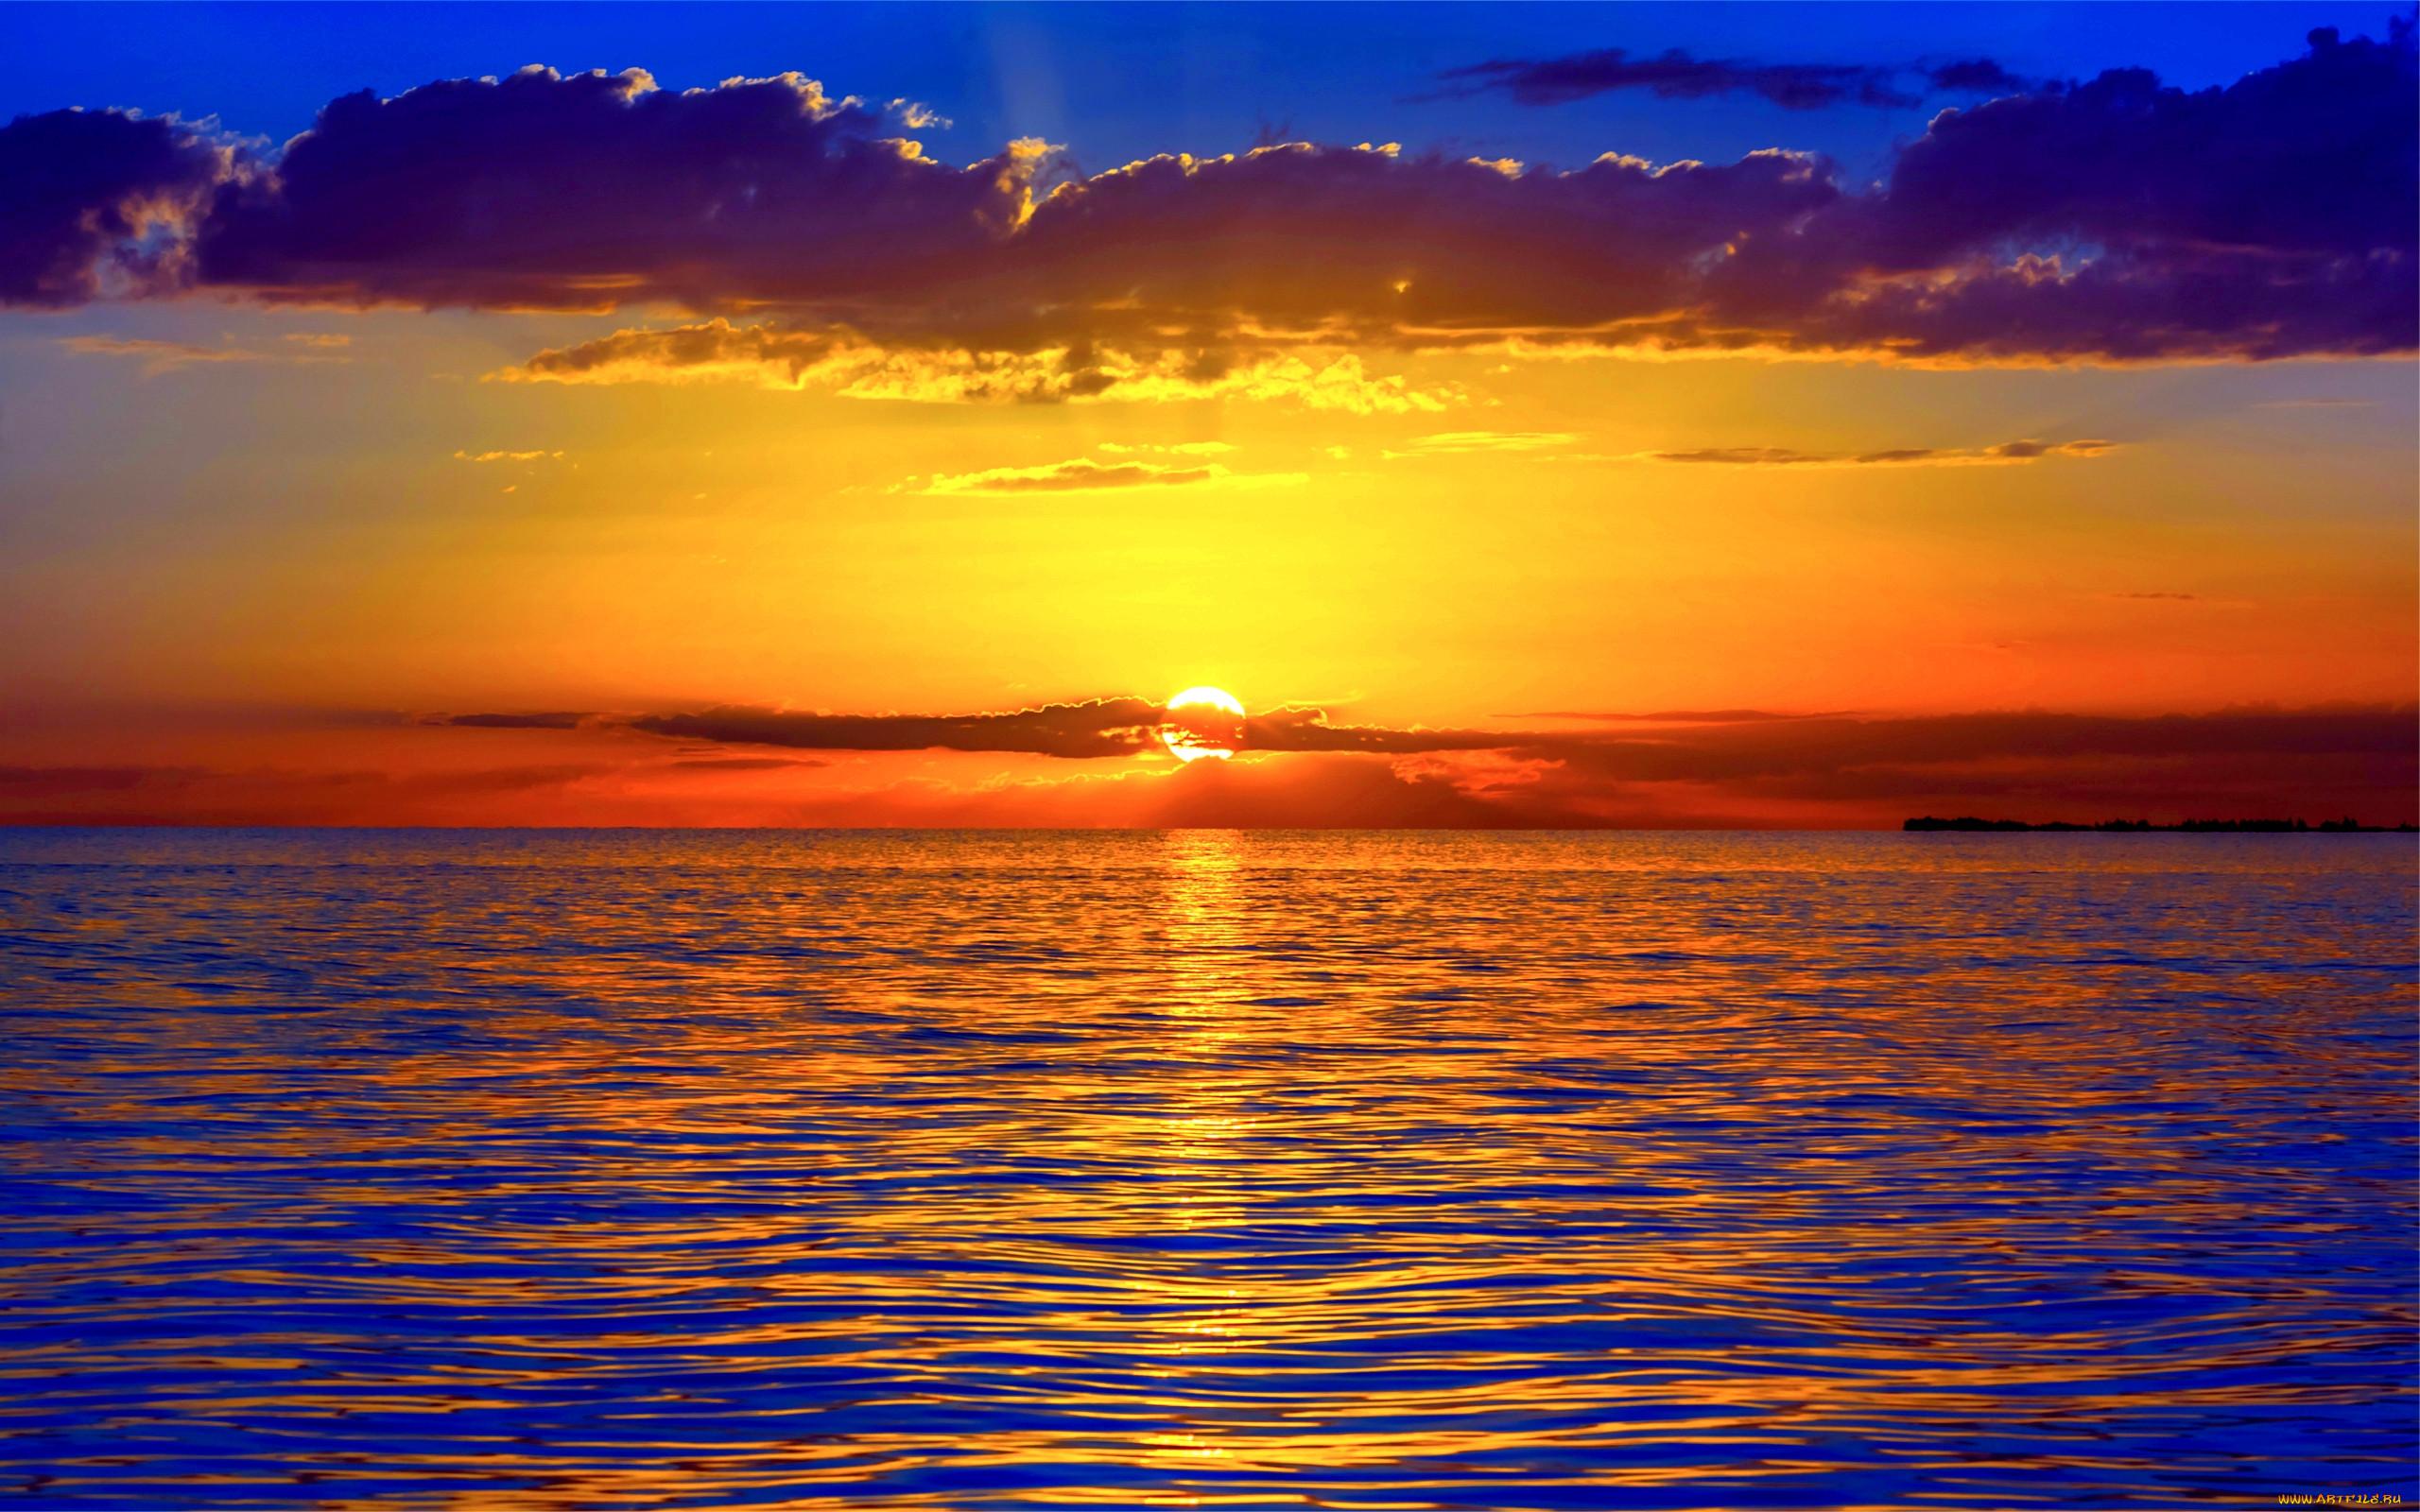 Фоторепортаж про озеро морской куда